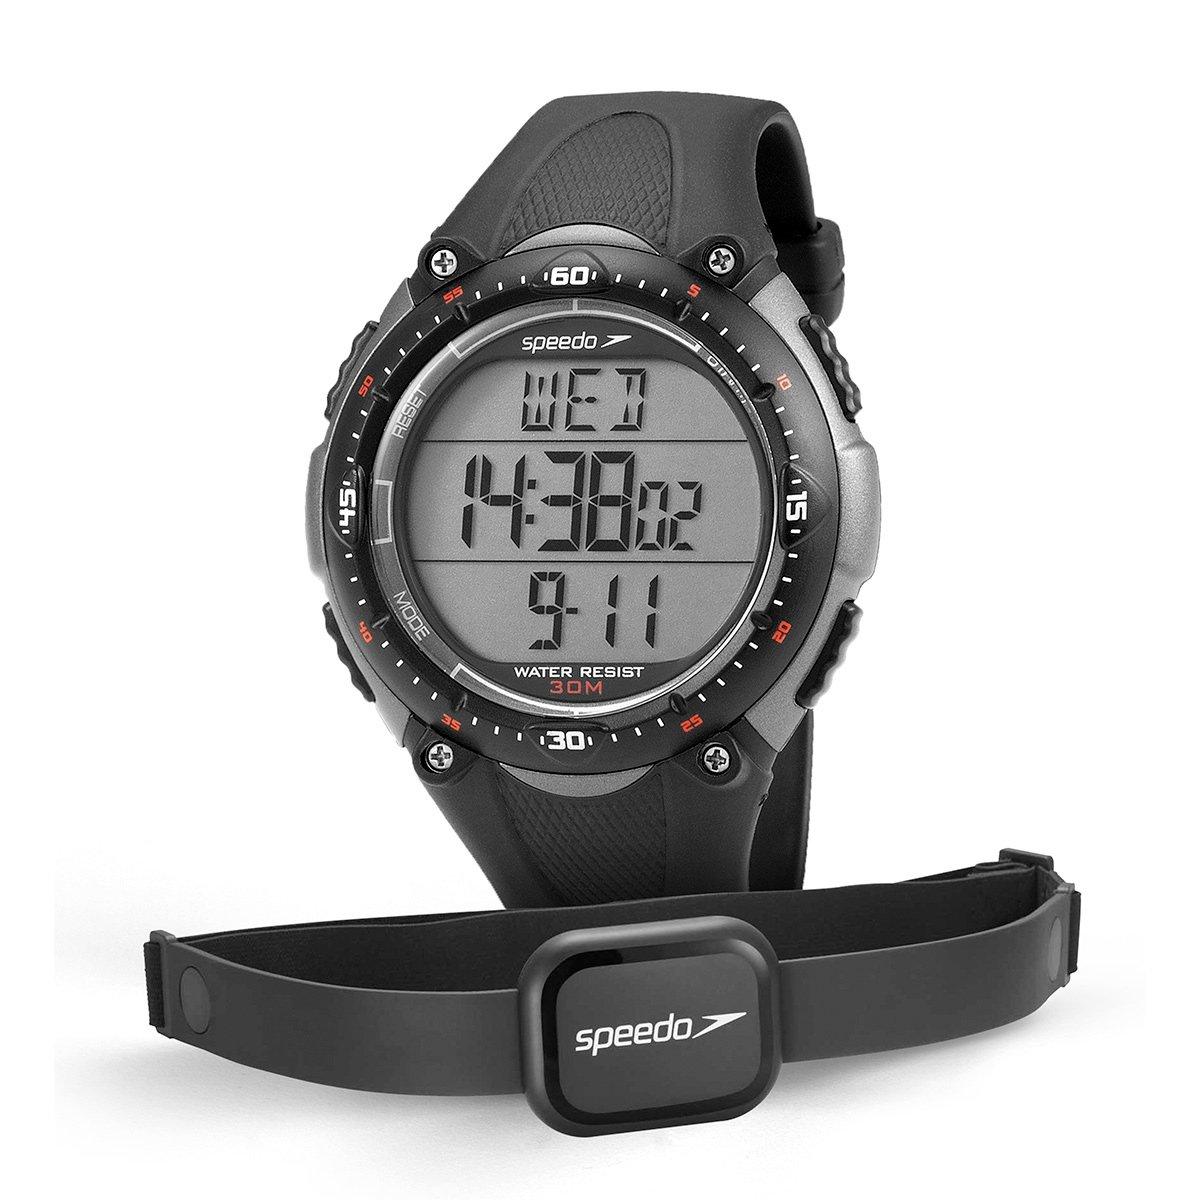 Monitor Cardíaco Speedo Jest 80565G0EPNP